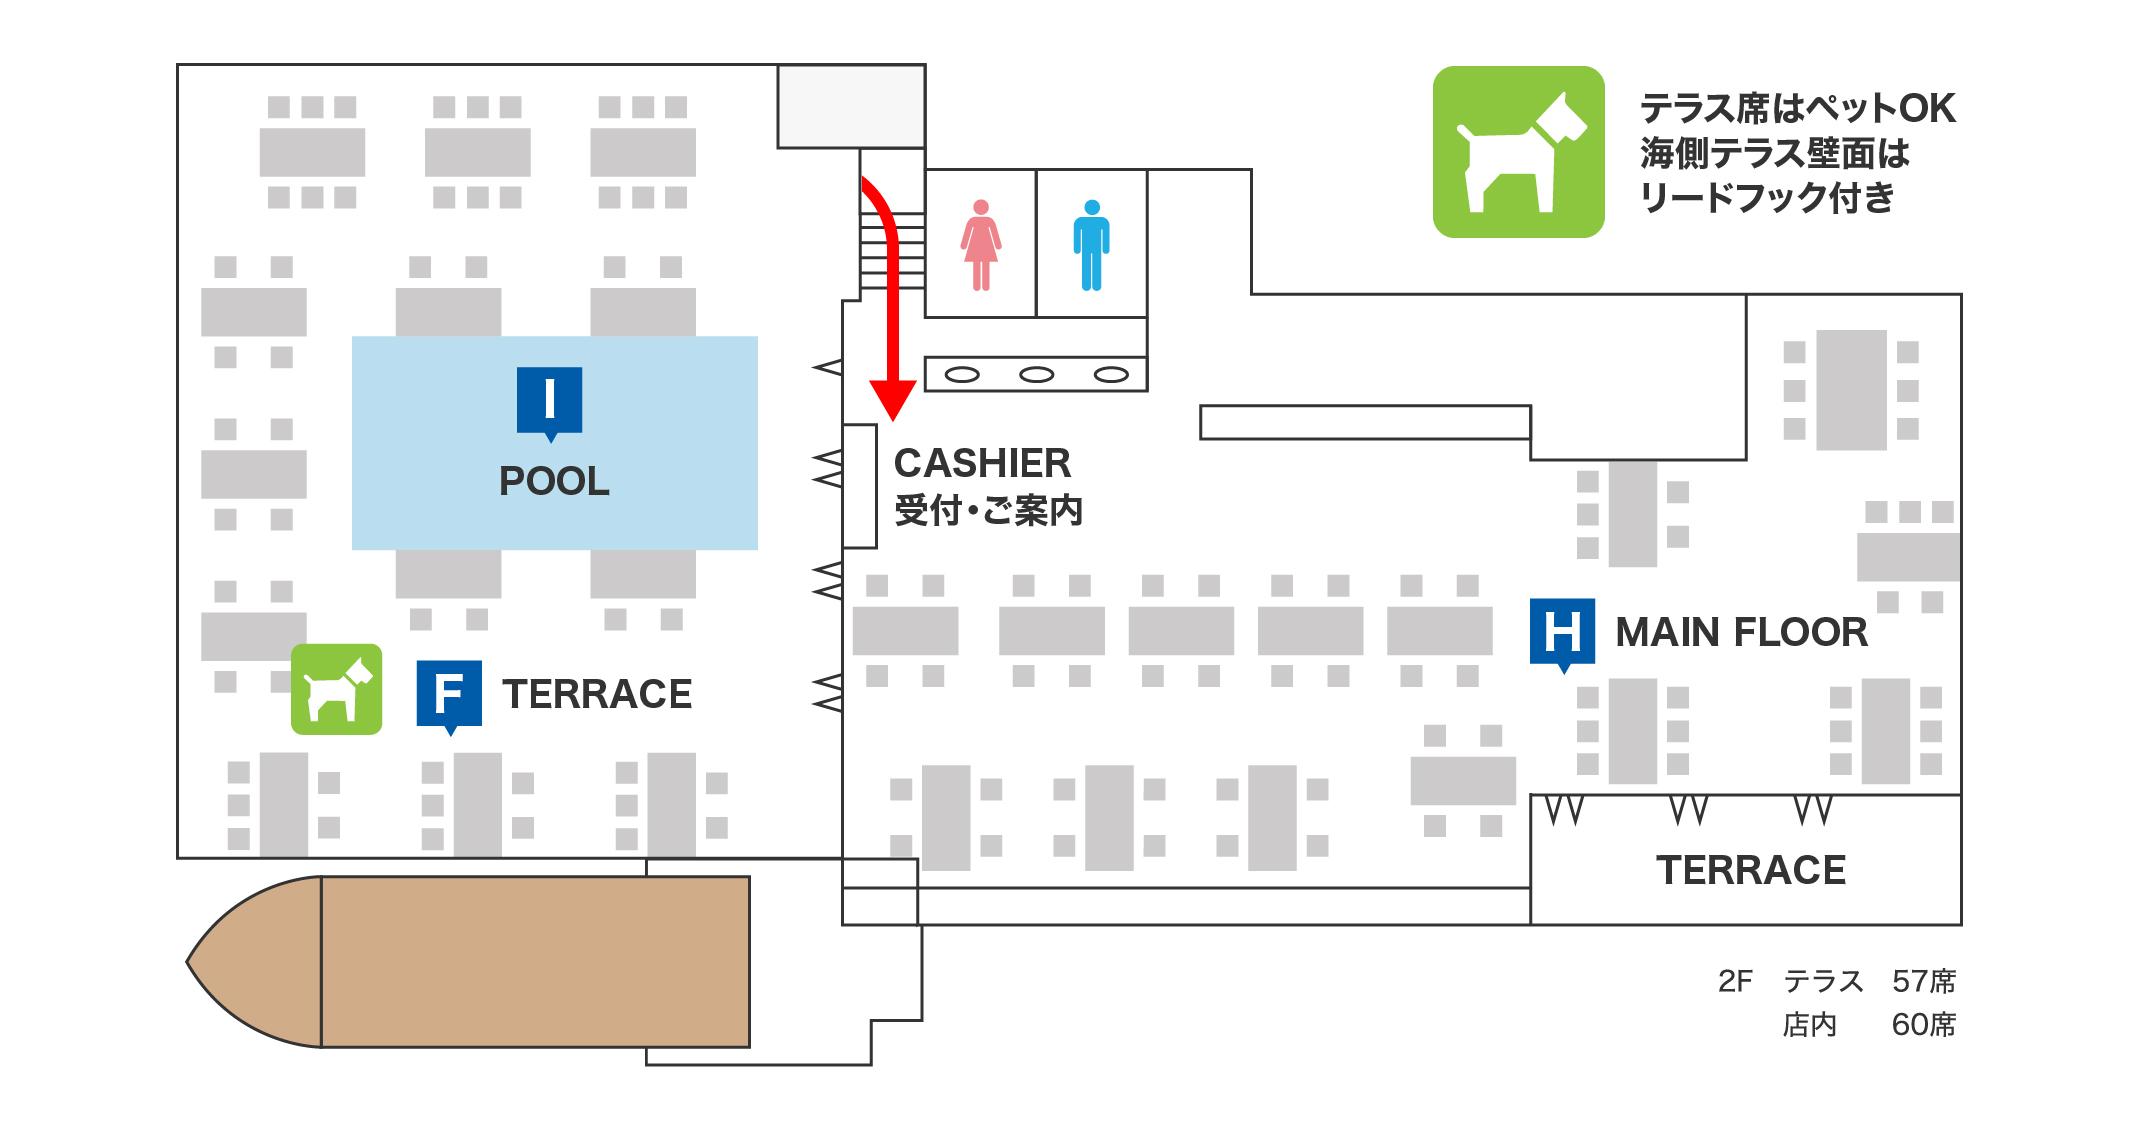 2F_平面図